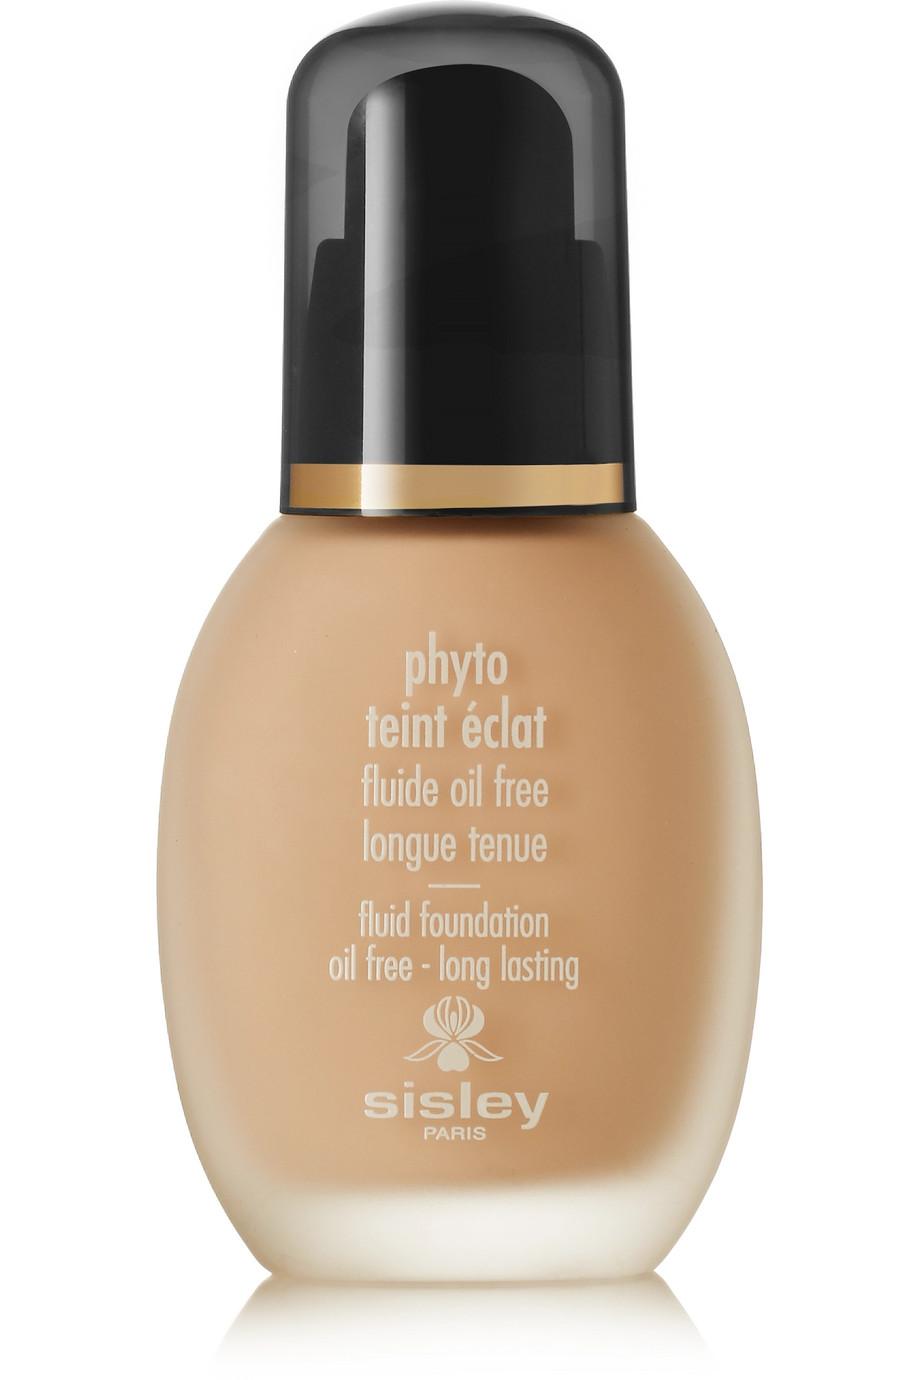 Sisley - Paris - Phyto-Teint éclat Fluid Foundation